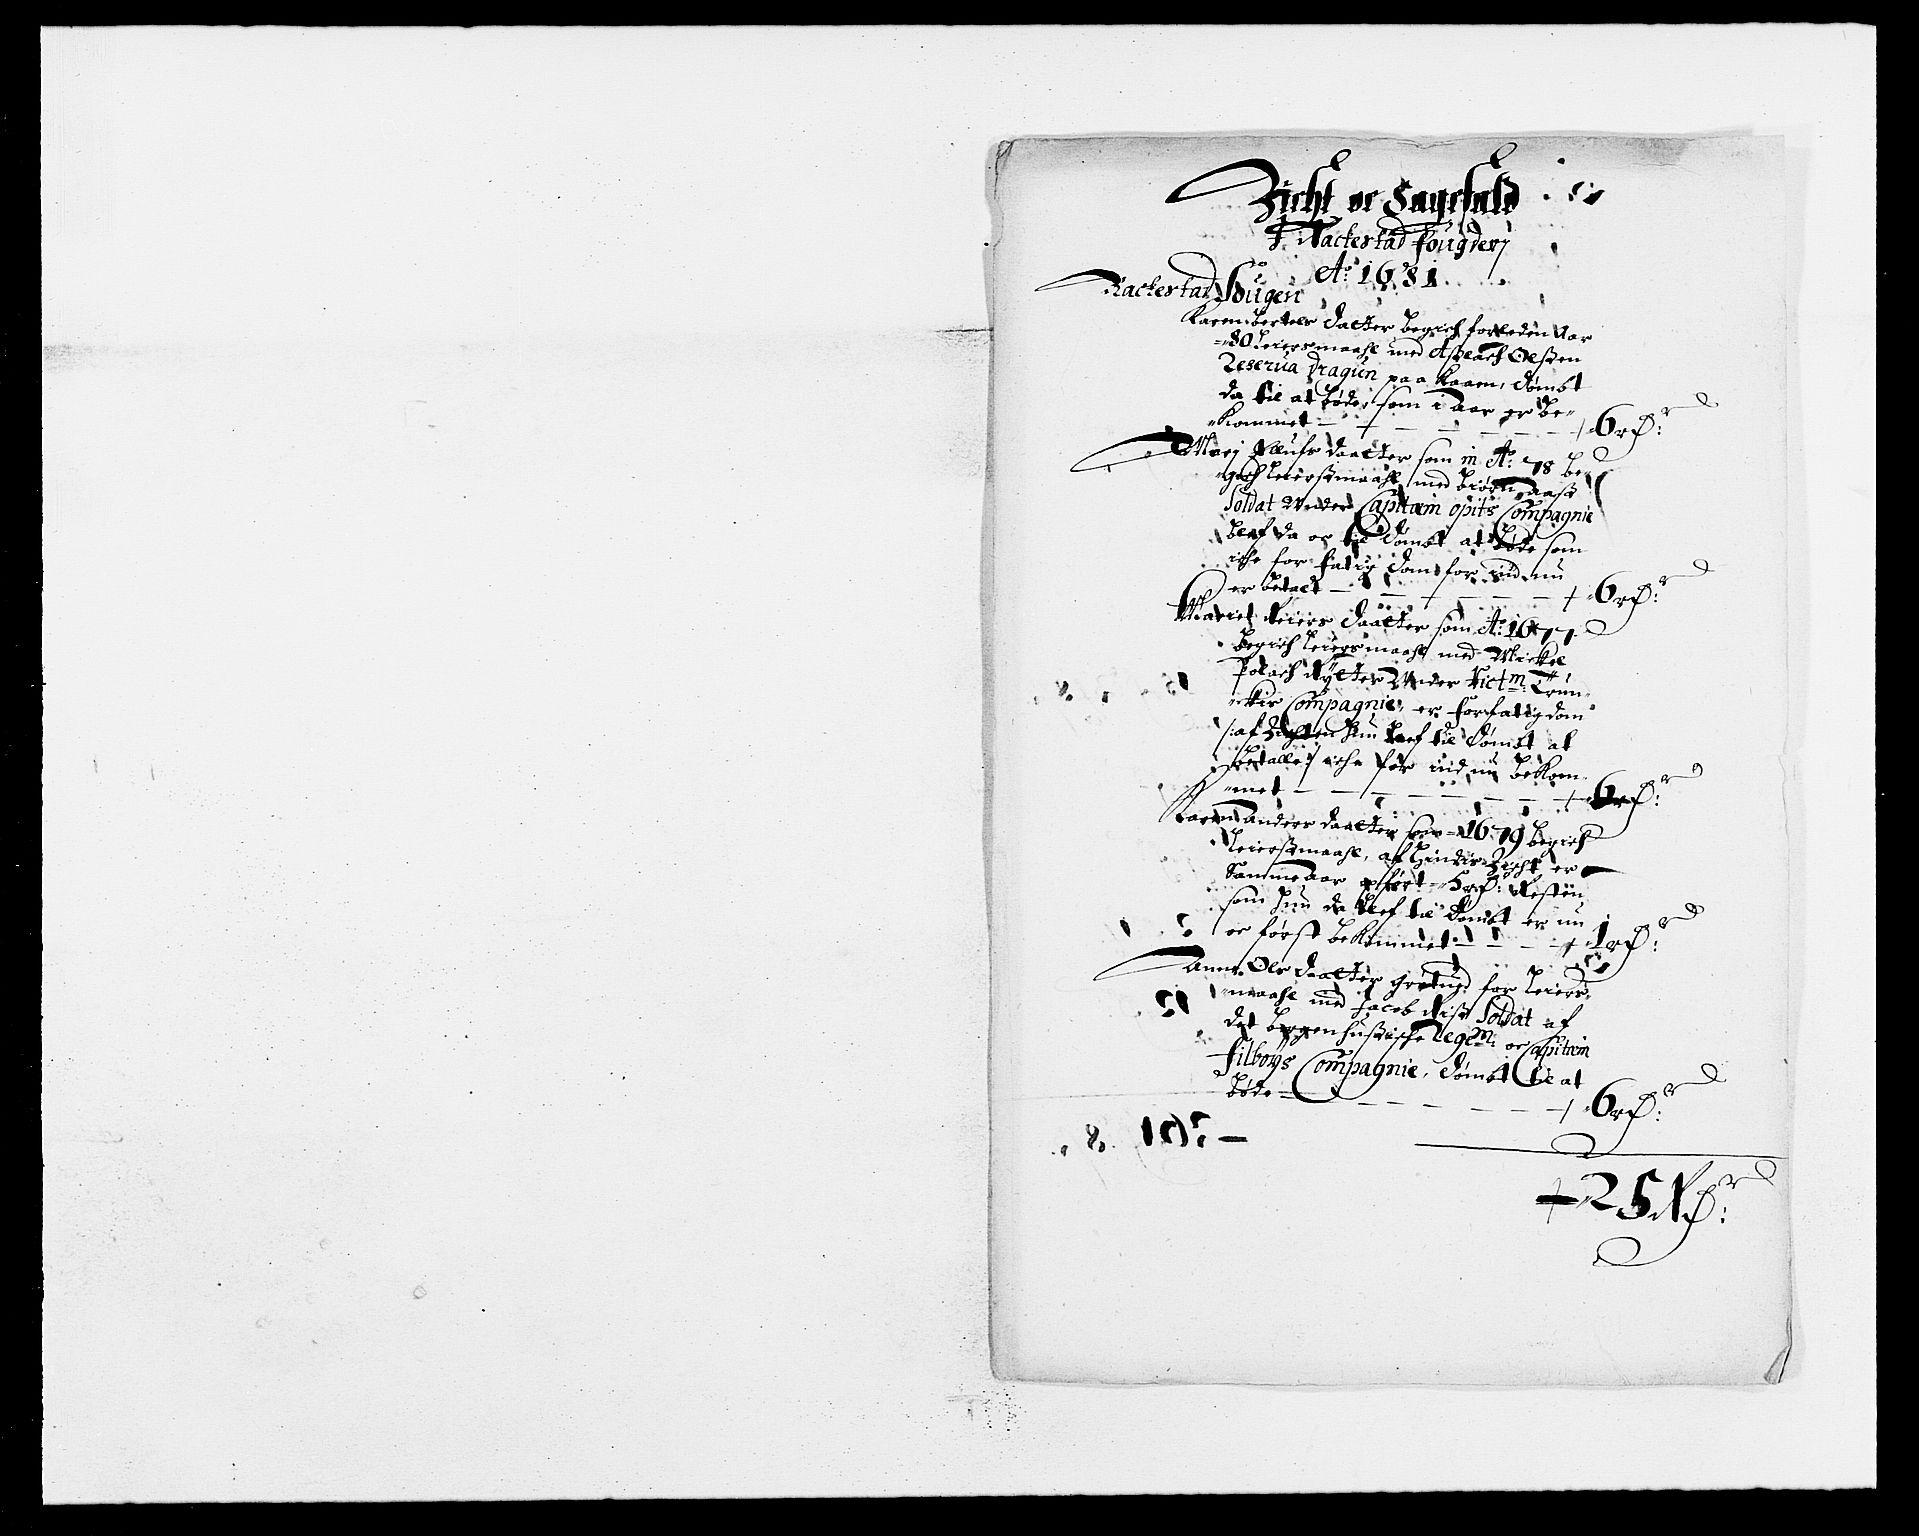 RA, Rentekammeret inntil 1814, Reviderte regnskaper, Fogderegnskap, R05/L0272: Fogderegnskap Rakkestad, 1680-1681, s. 249